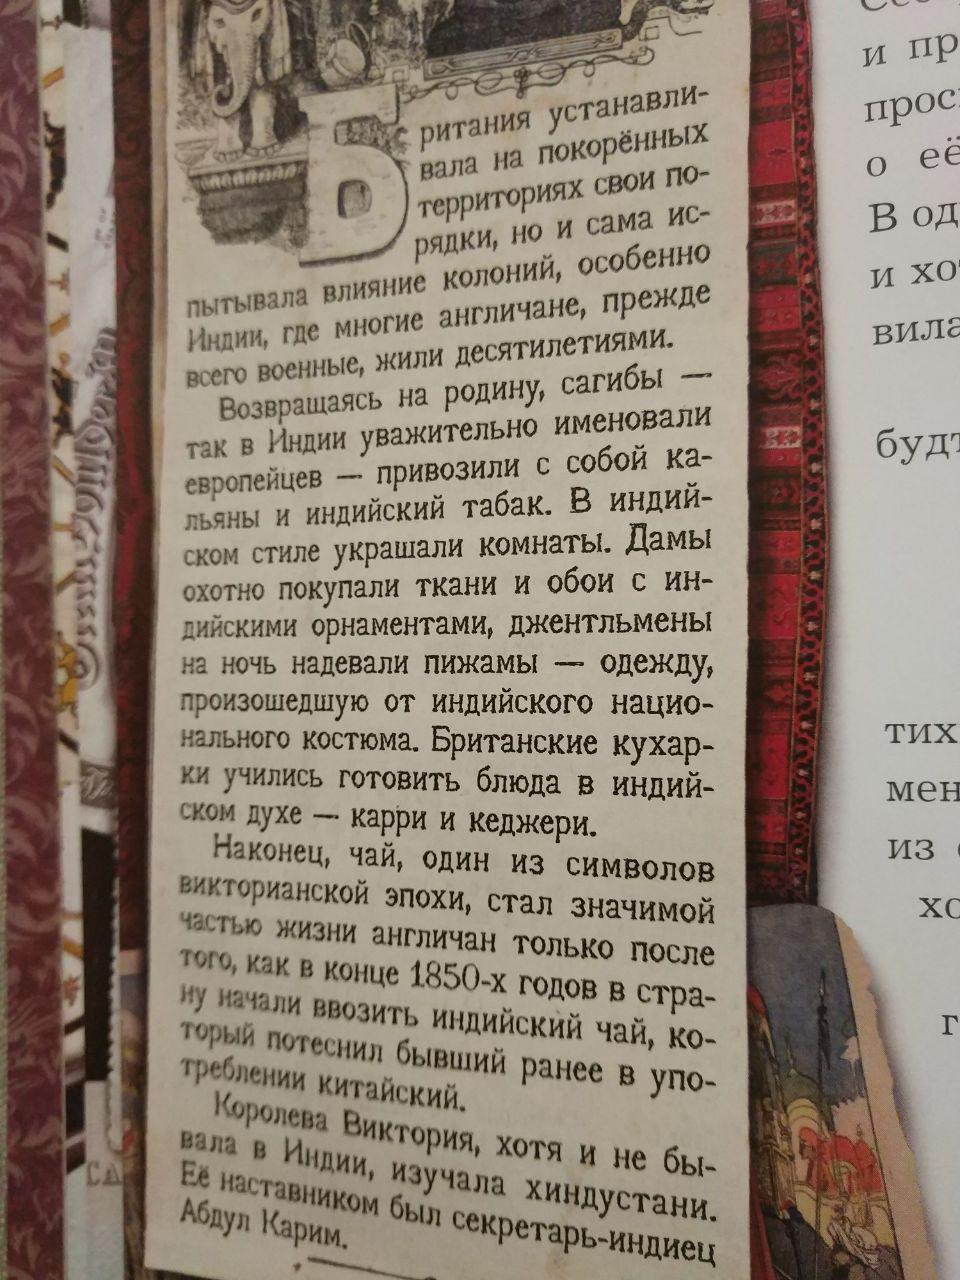 http://s3.uploads.ru/yhR6O.jpg